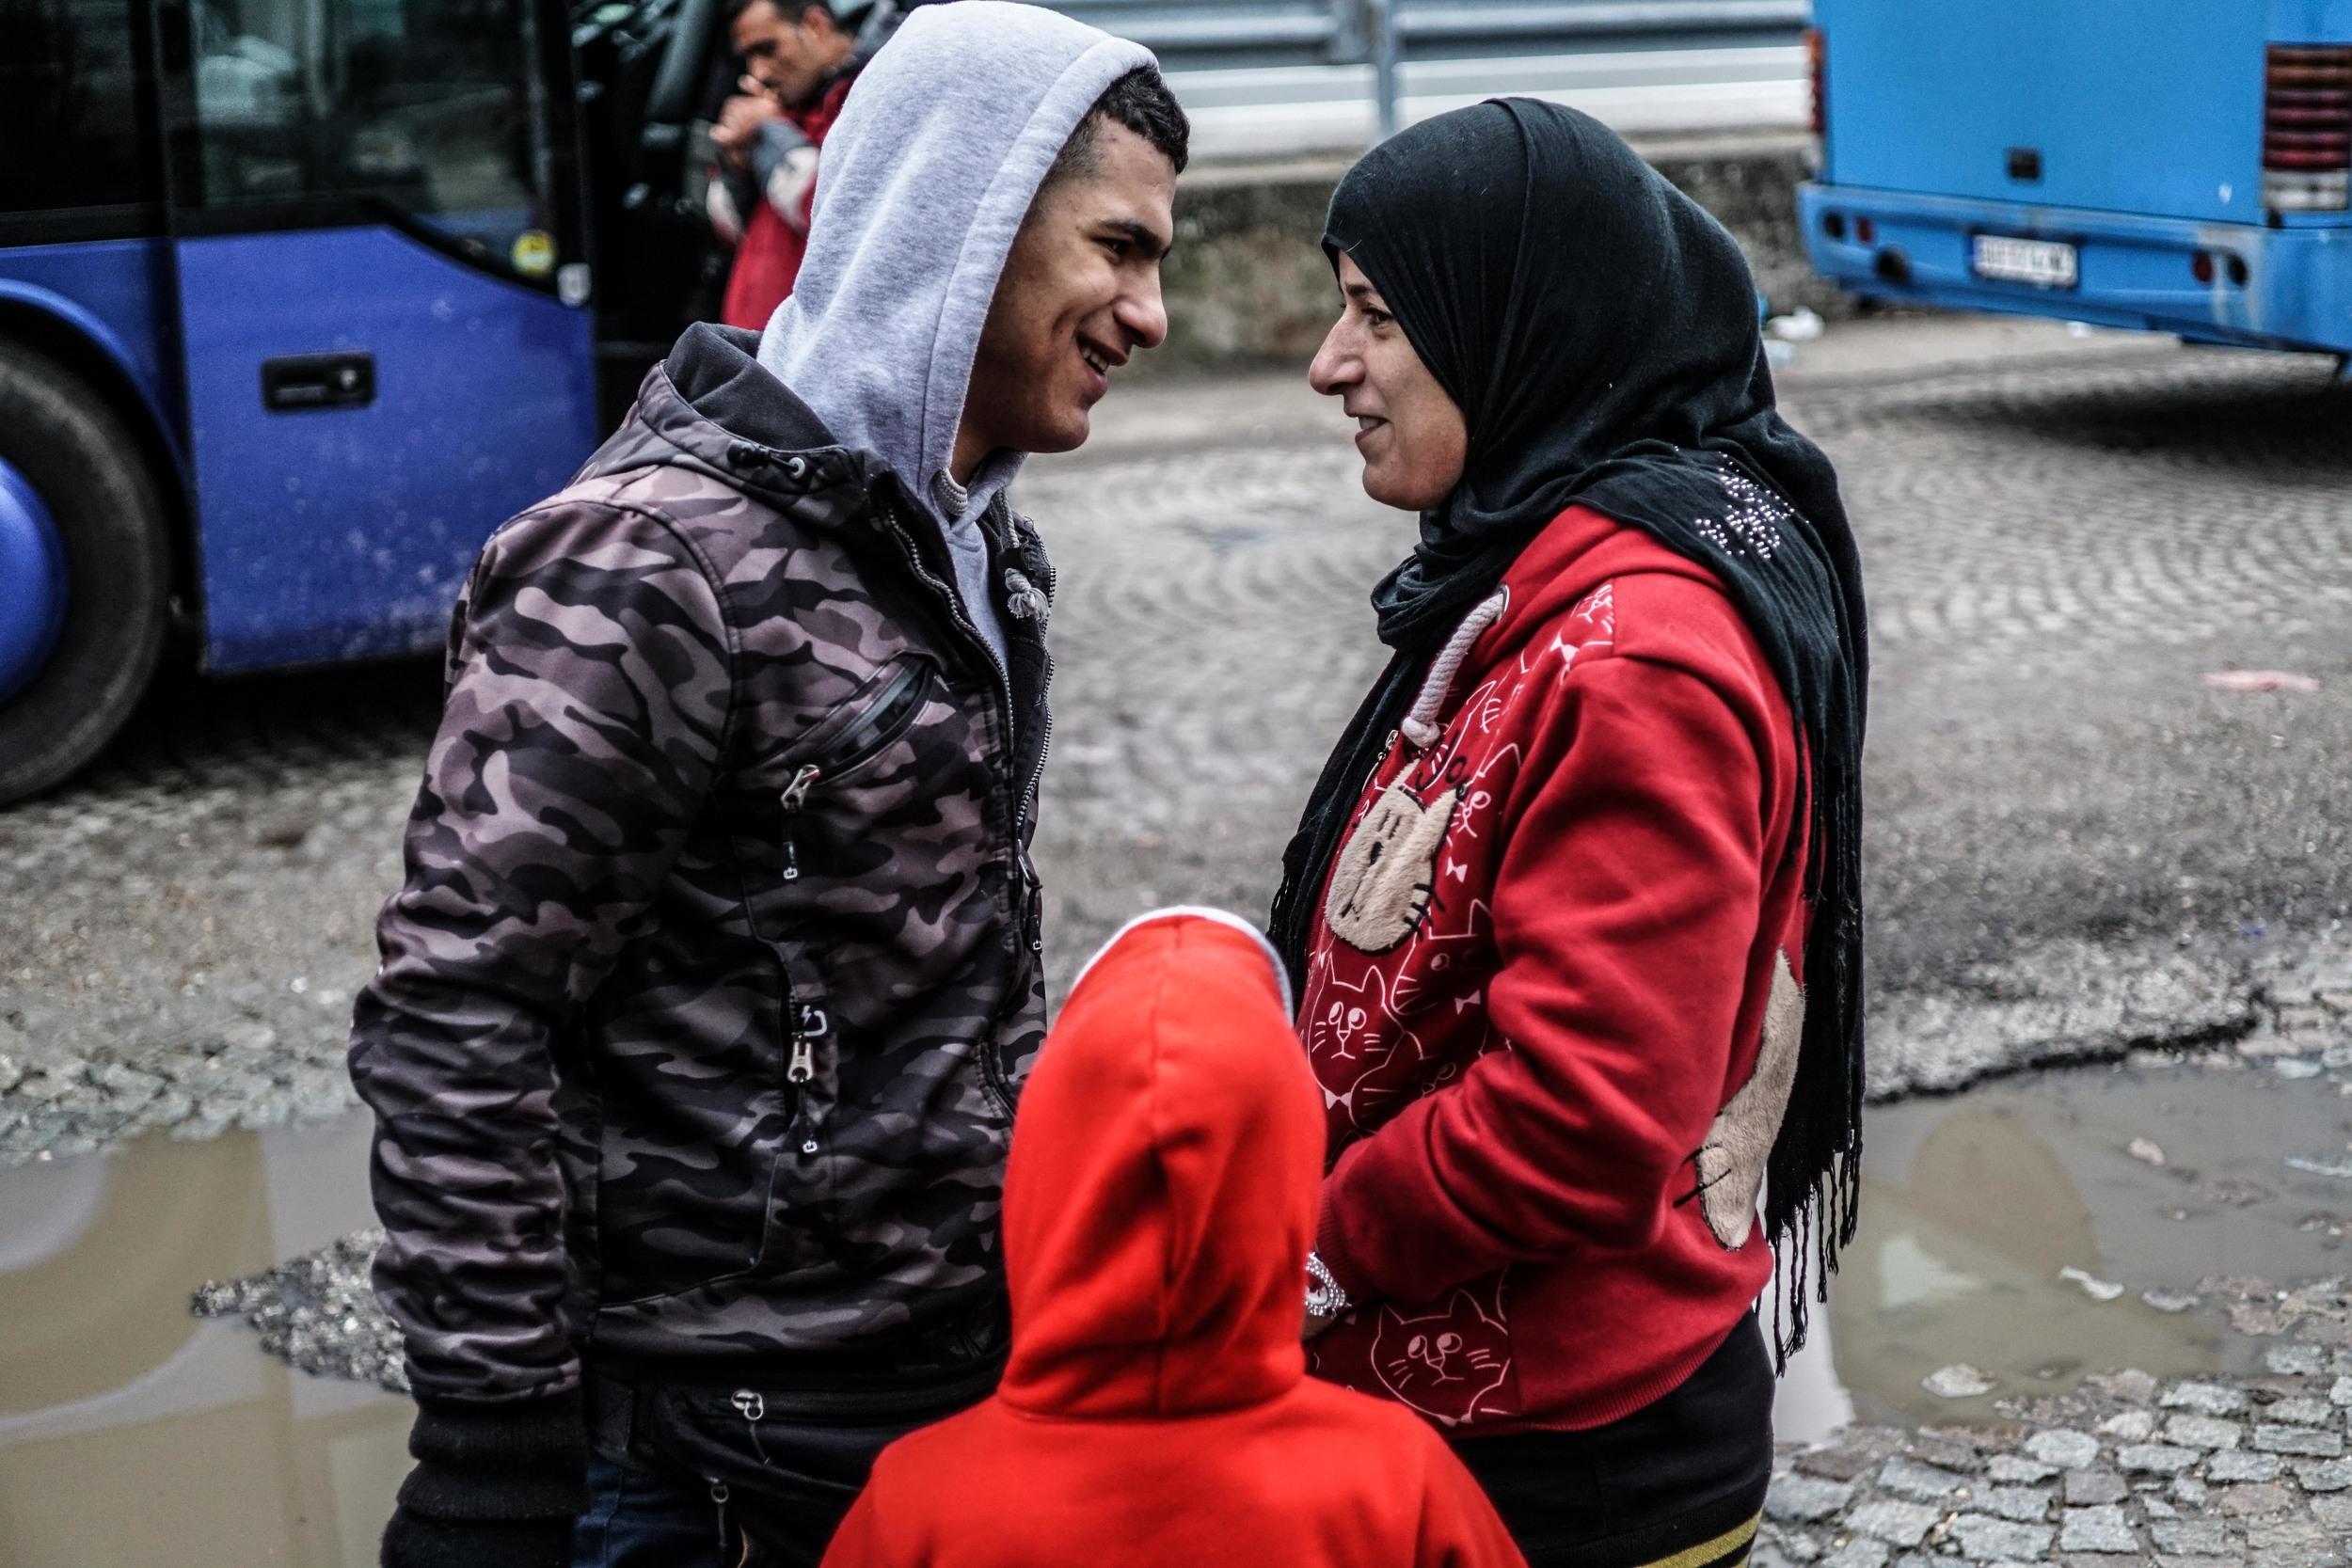 Syrian Refugee Crisis Serbia November 2015 21.jpg